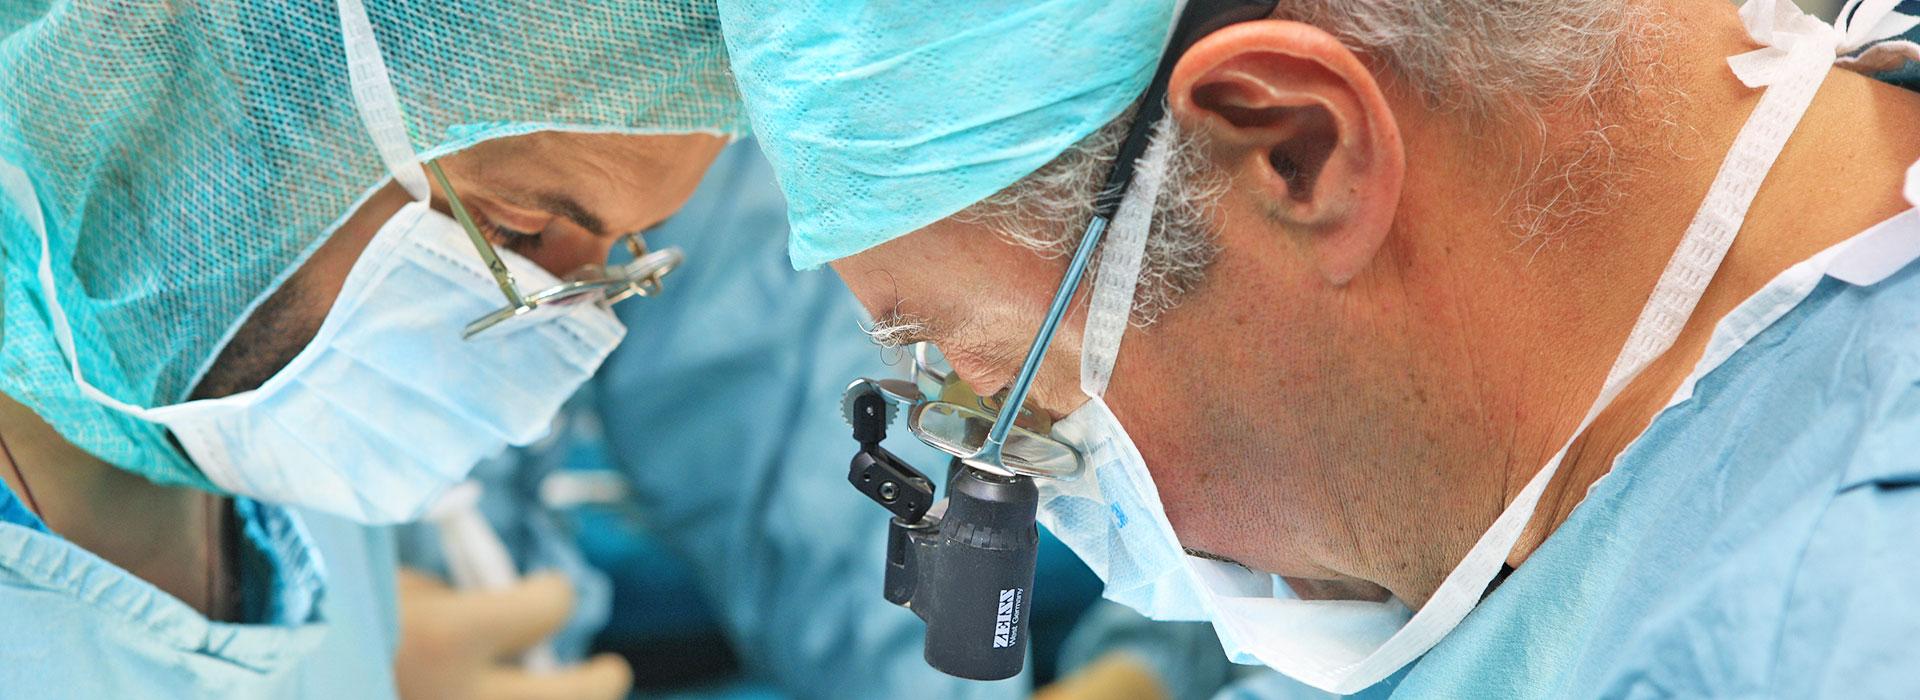 Xειρουργοί